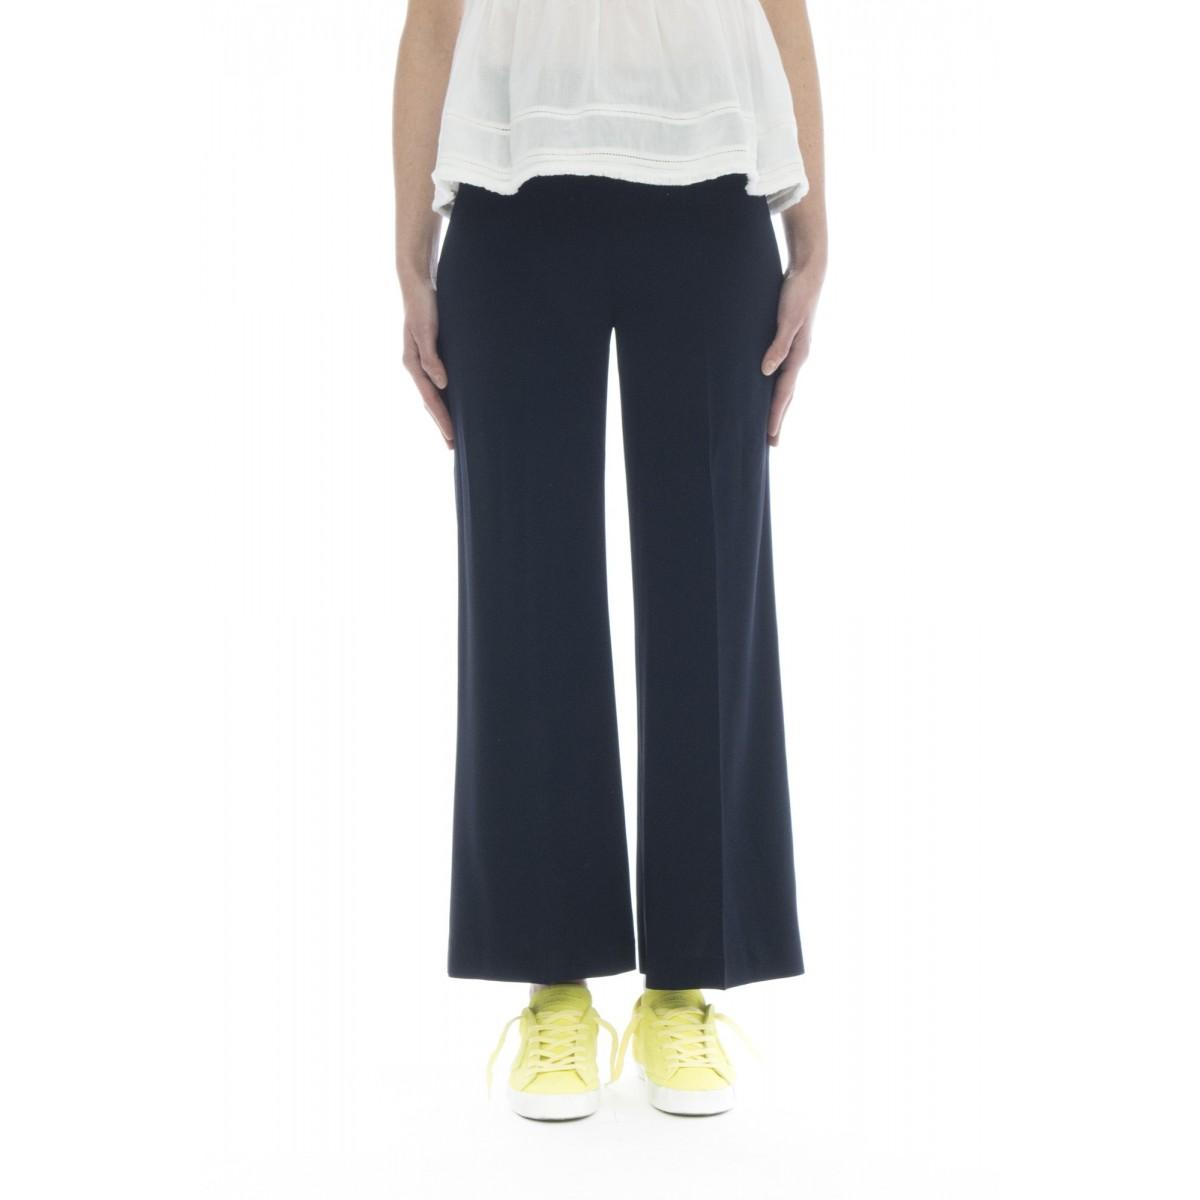 Pantalone donna - J4104 pantalone con elastico